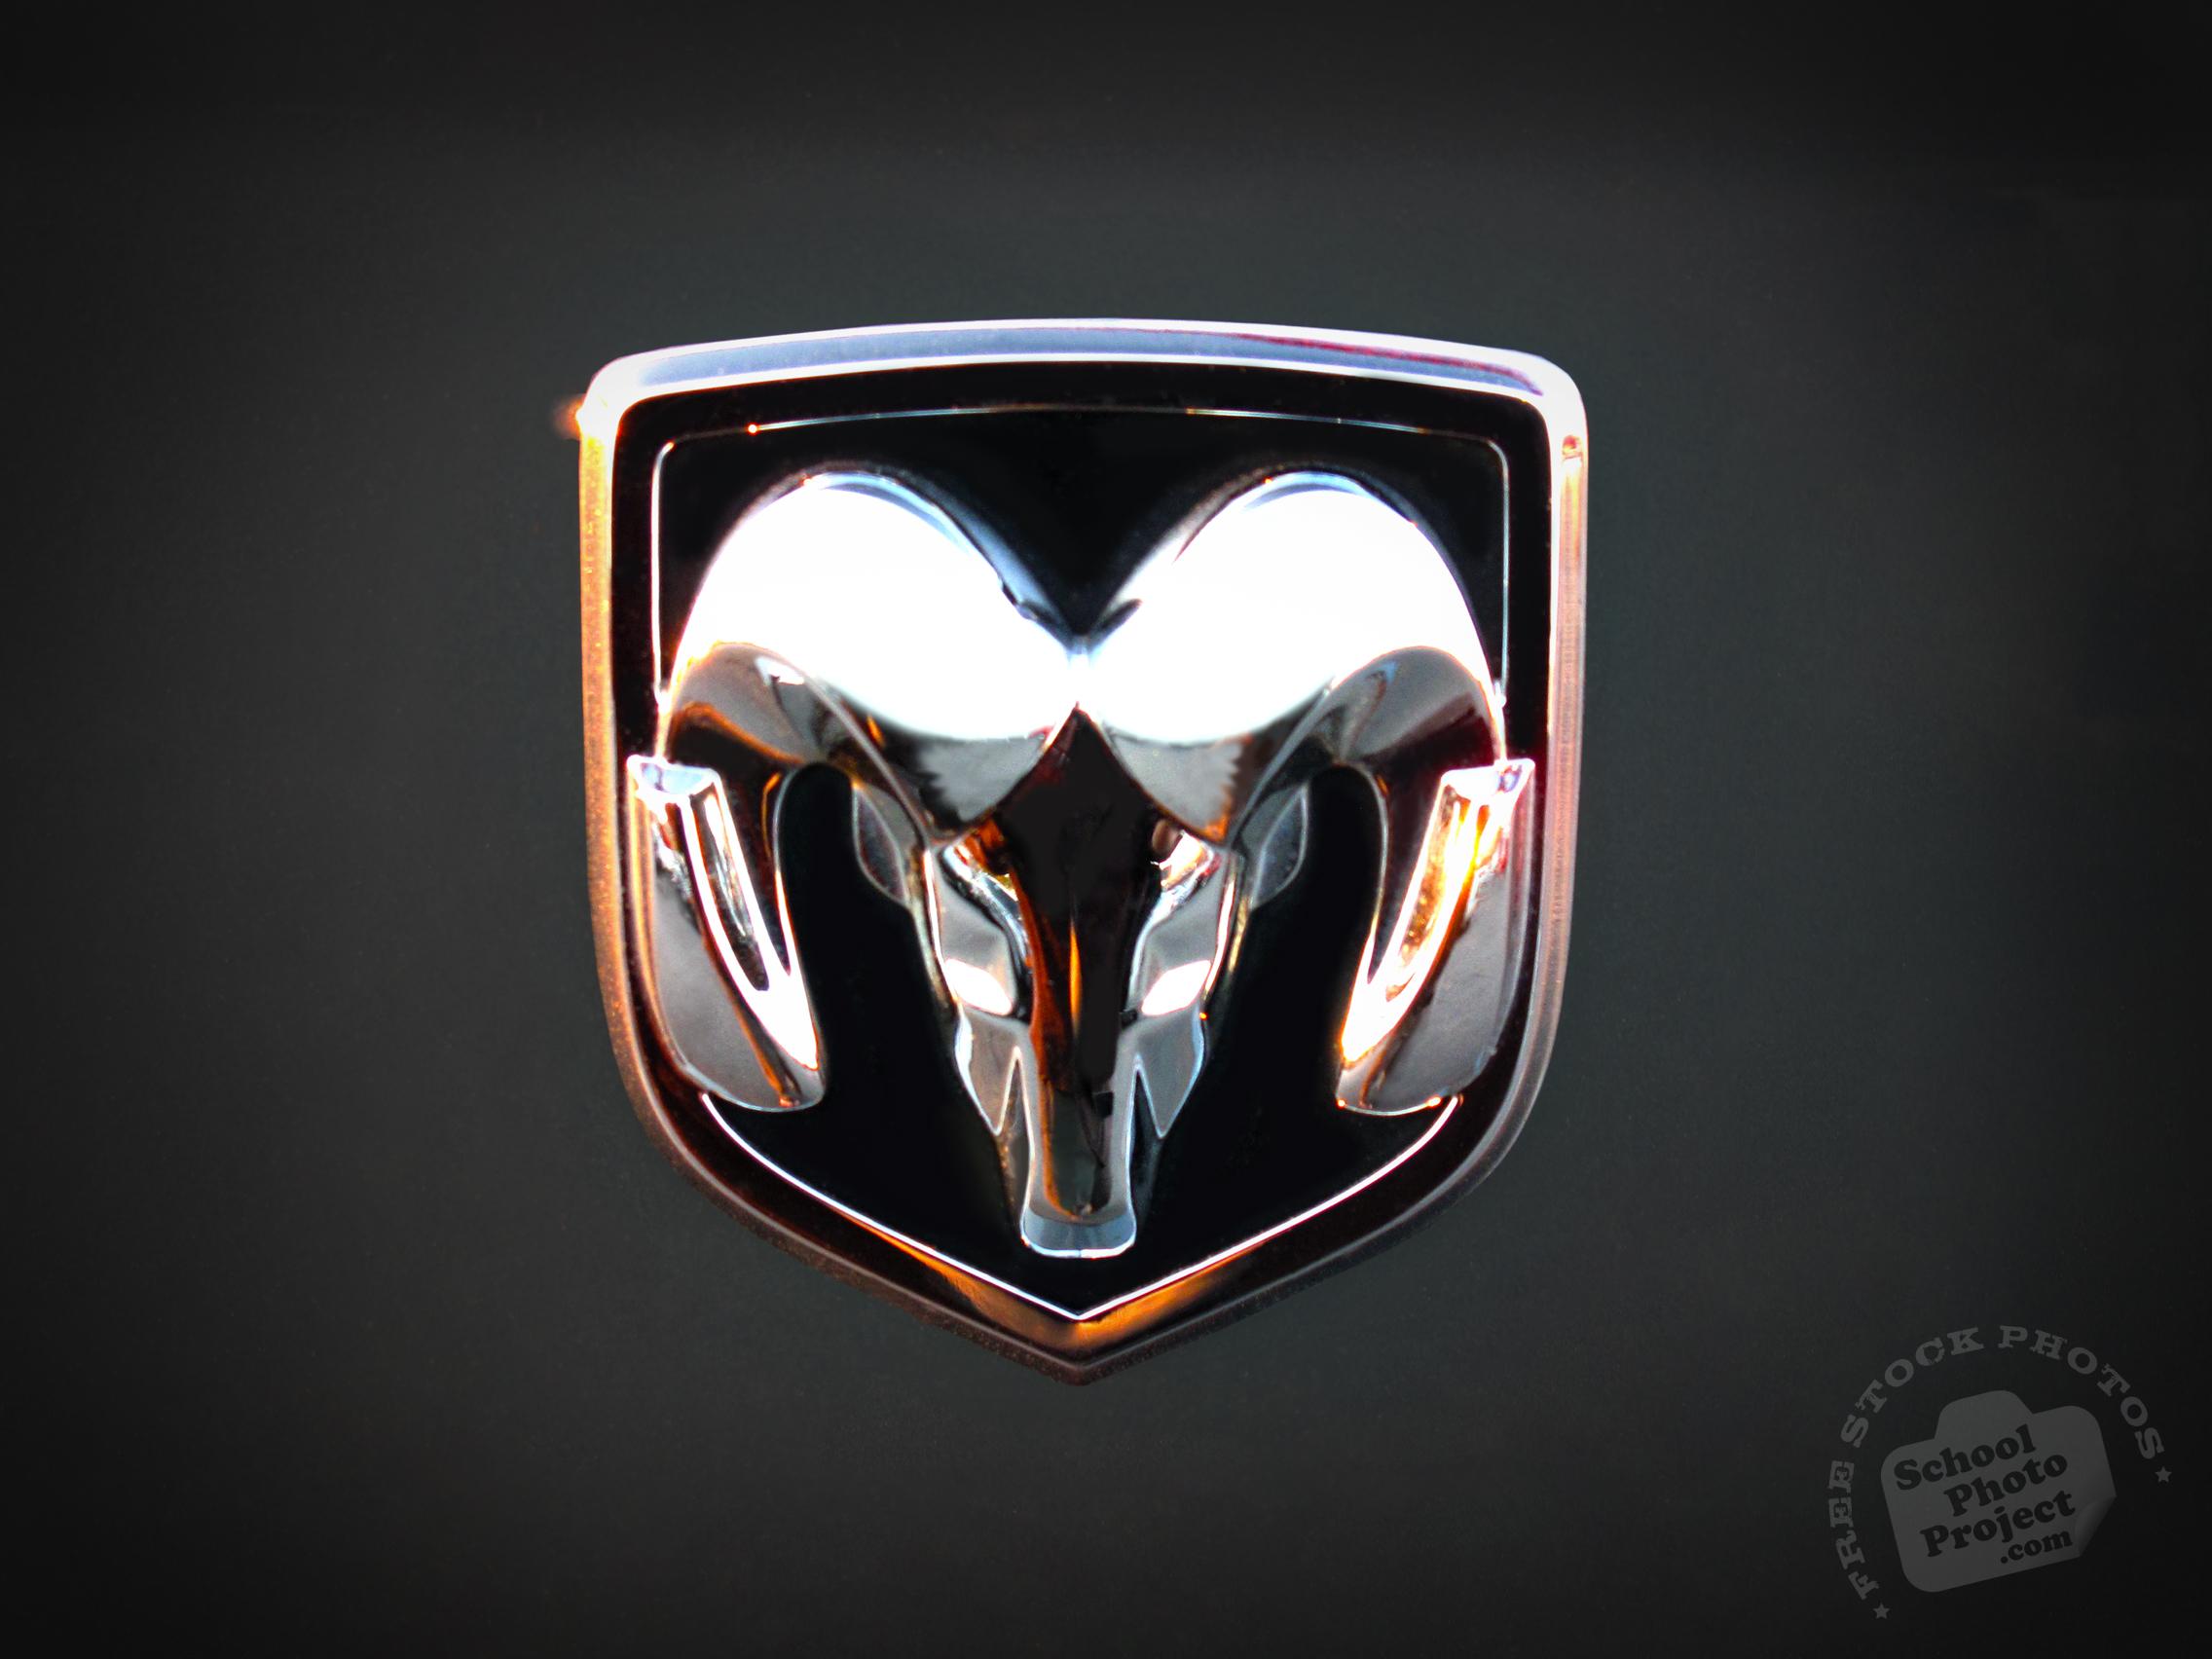 Free Dodge Ram Logo Dodge Ram Mark Famous Car Identity Royalty